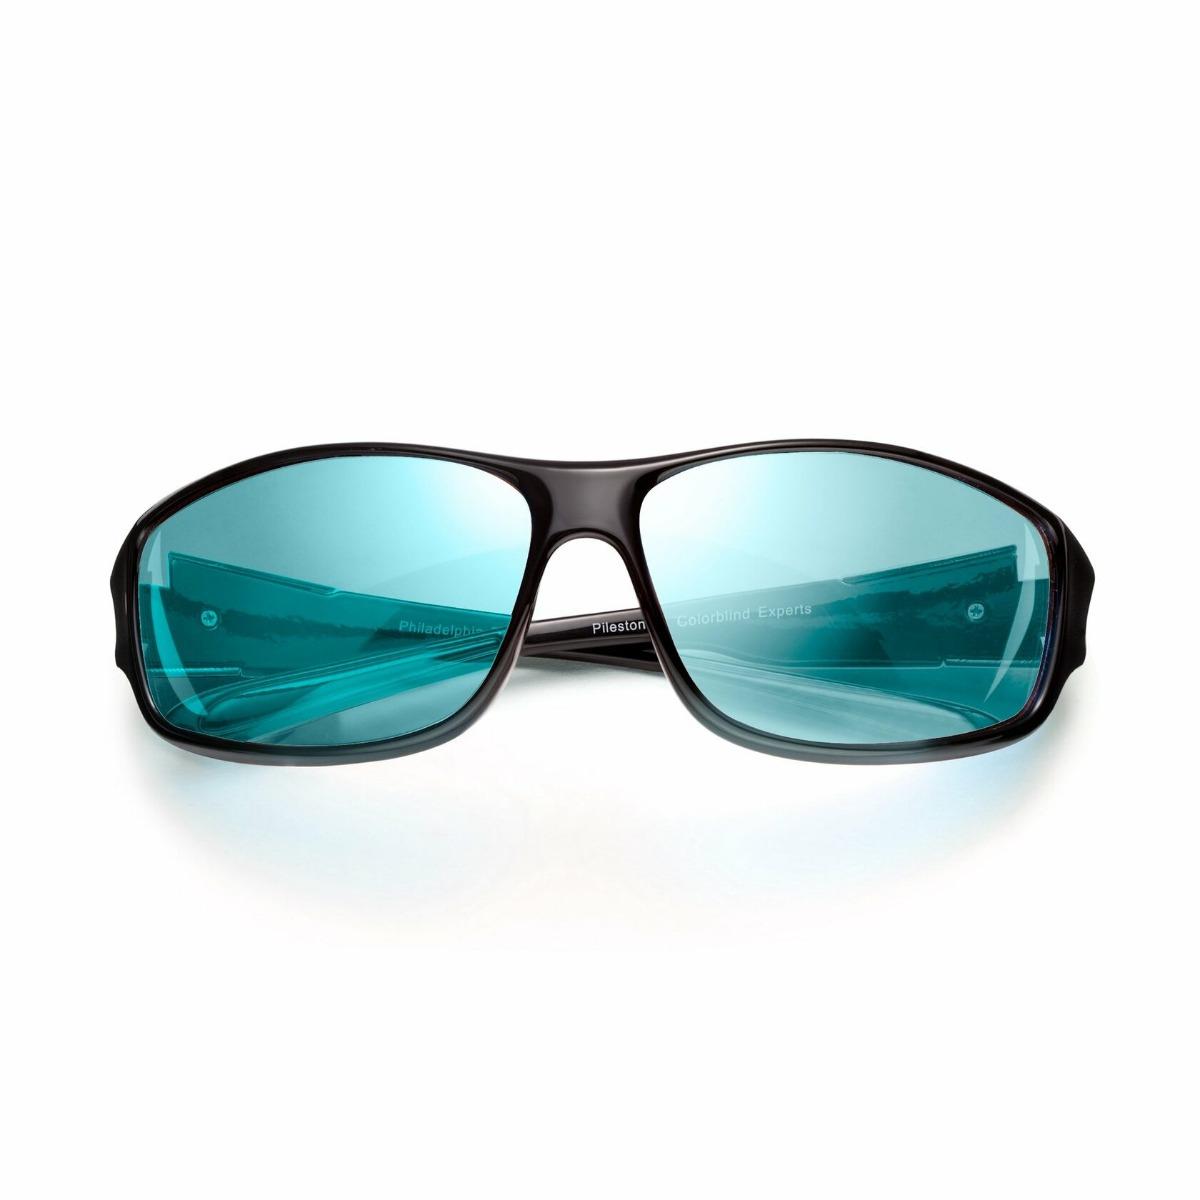 Очки для дальтоников Pilestone TP-017